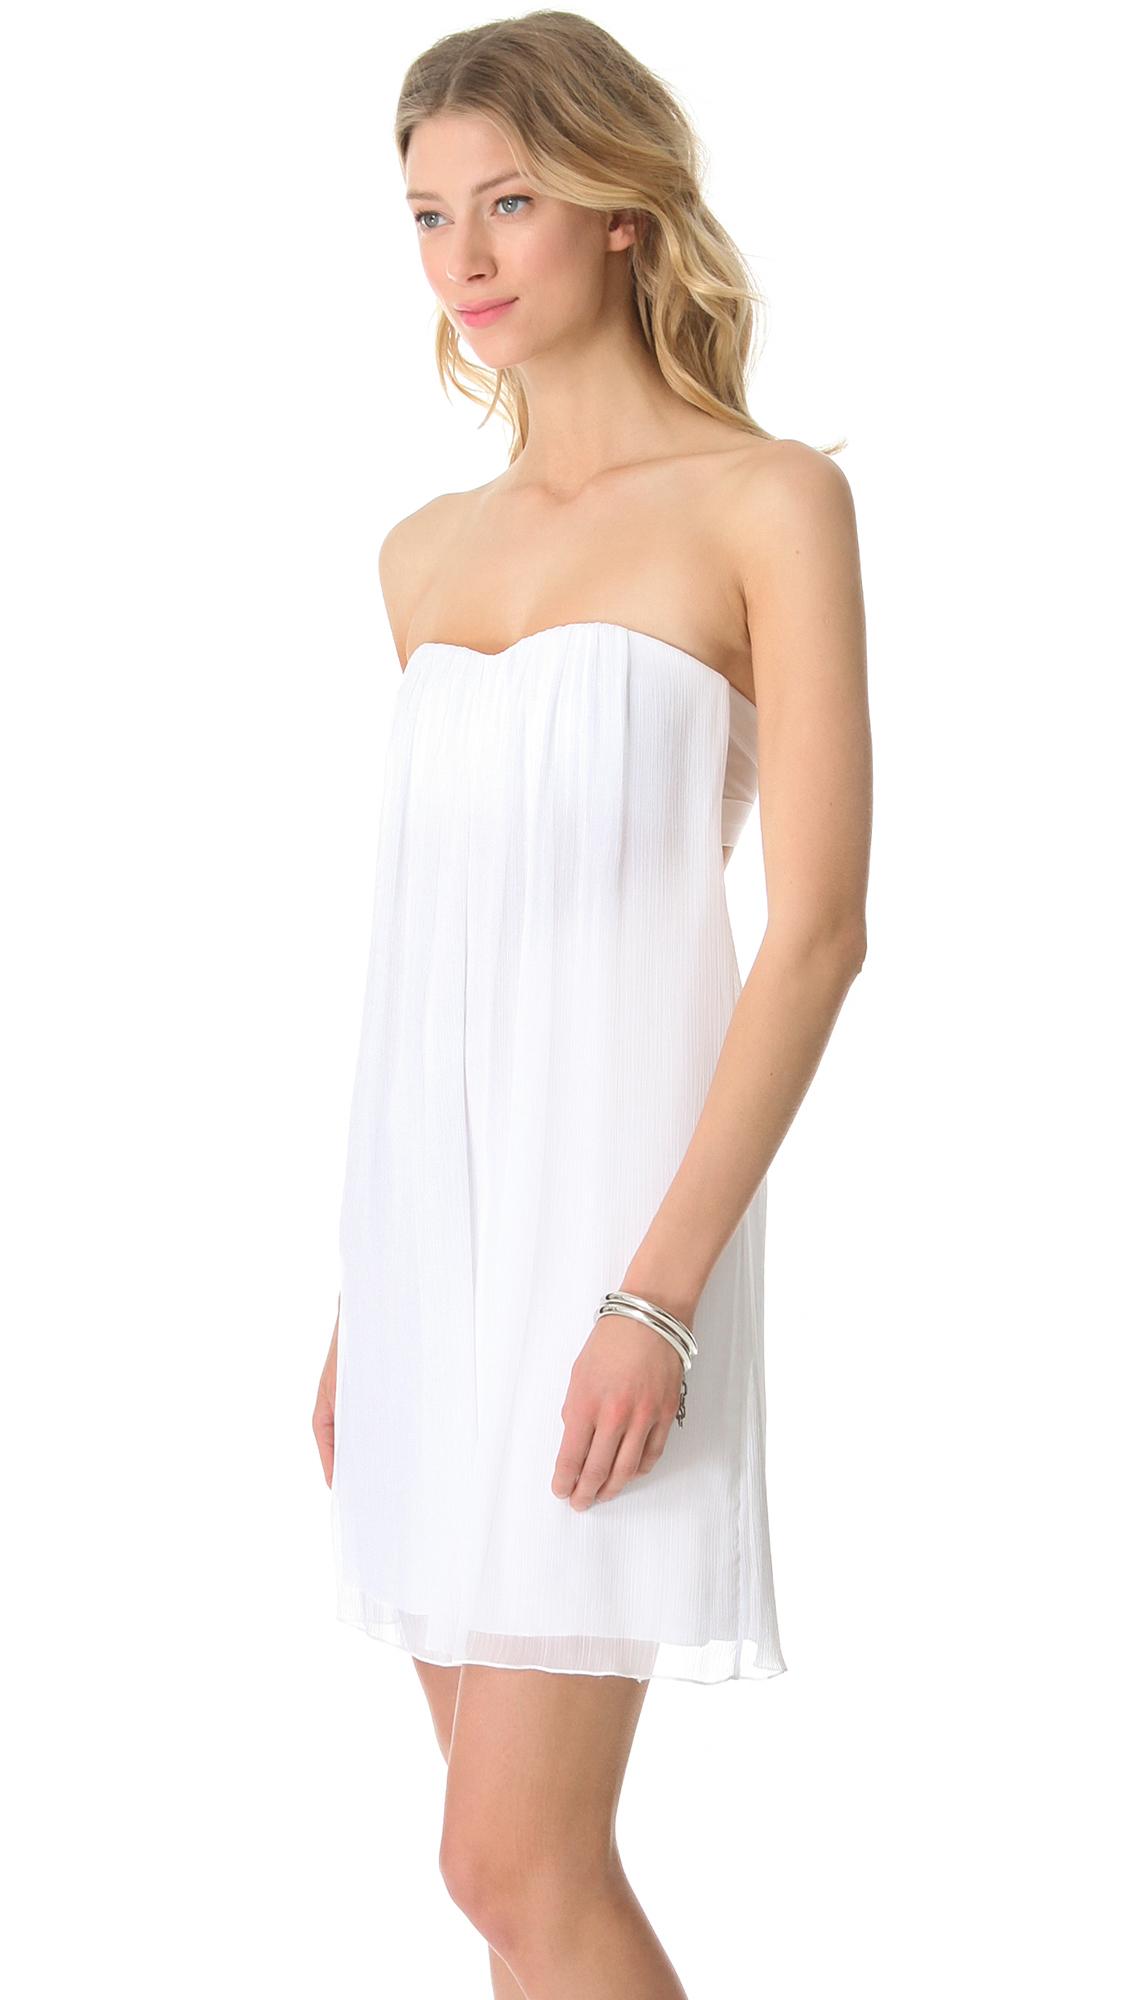 Lyst - Alice + Olivia Alice Olivia Center Drape Strapless Dress in White f10102419